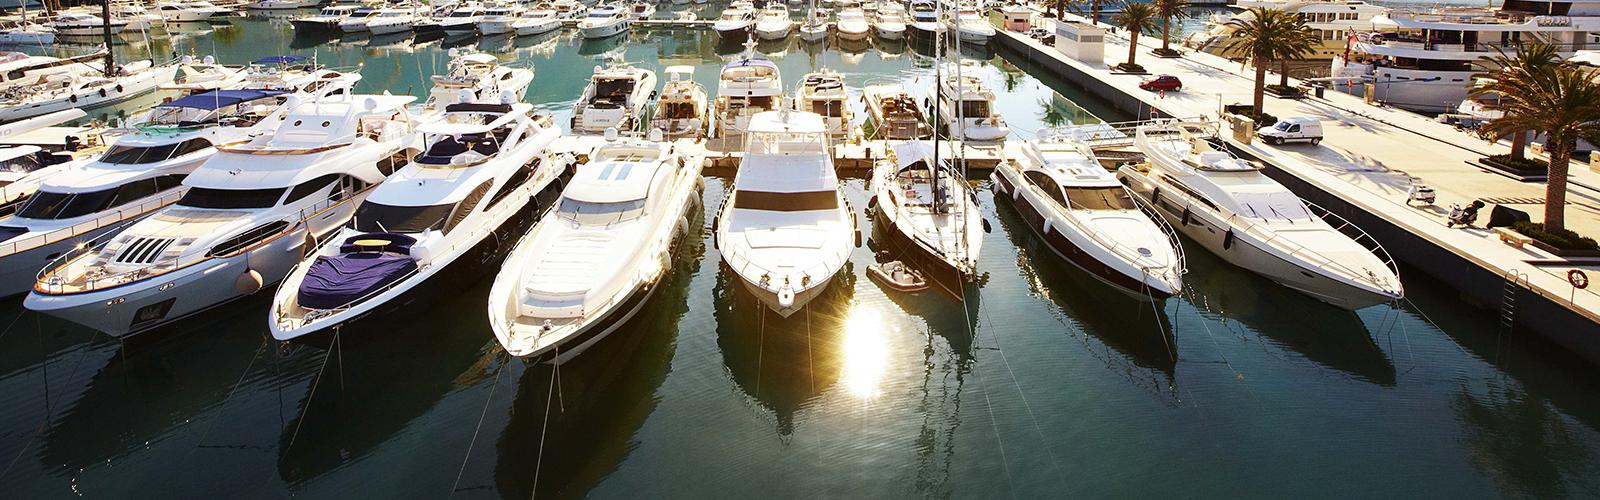 slide_yachts